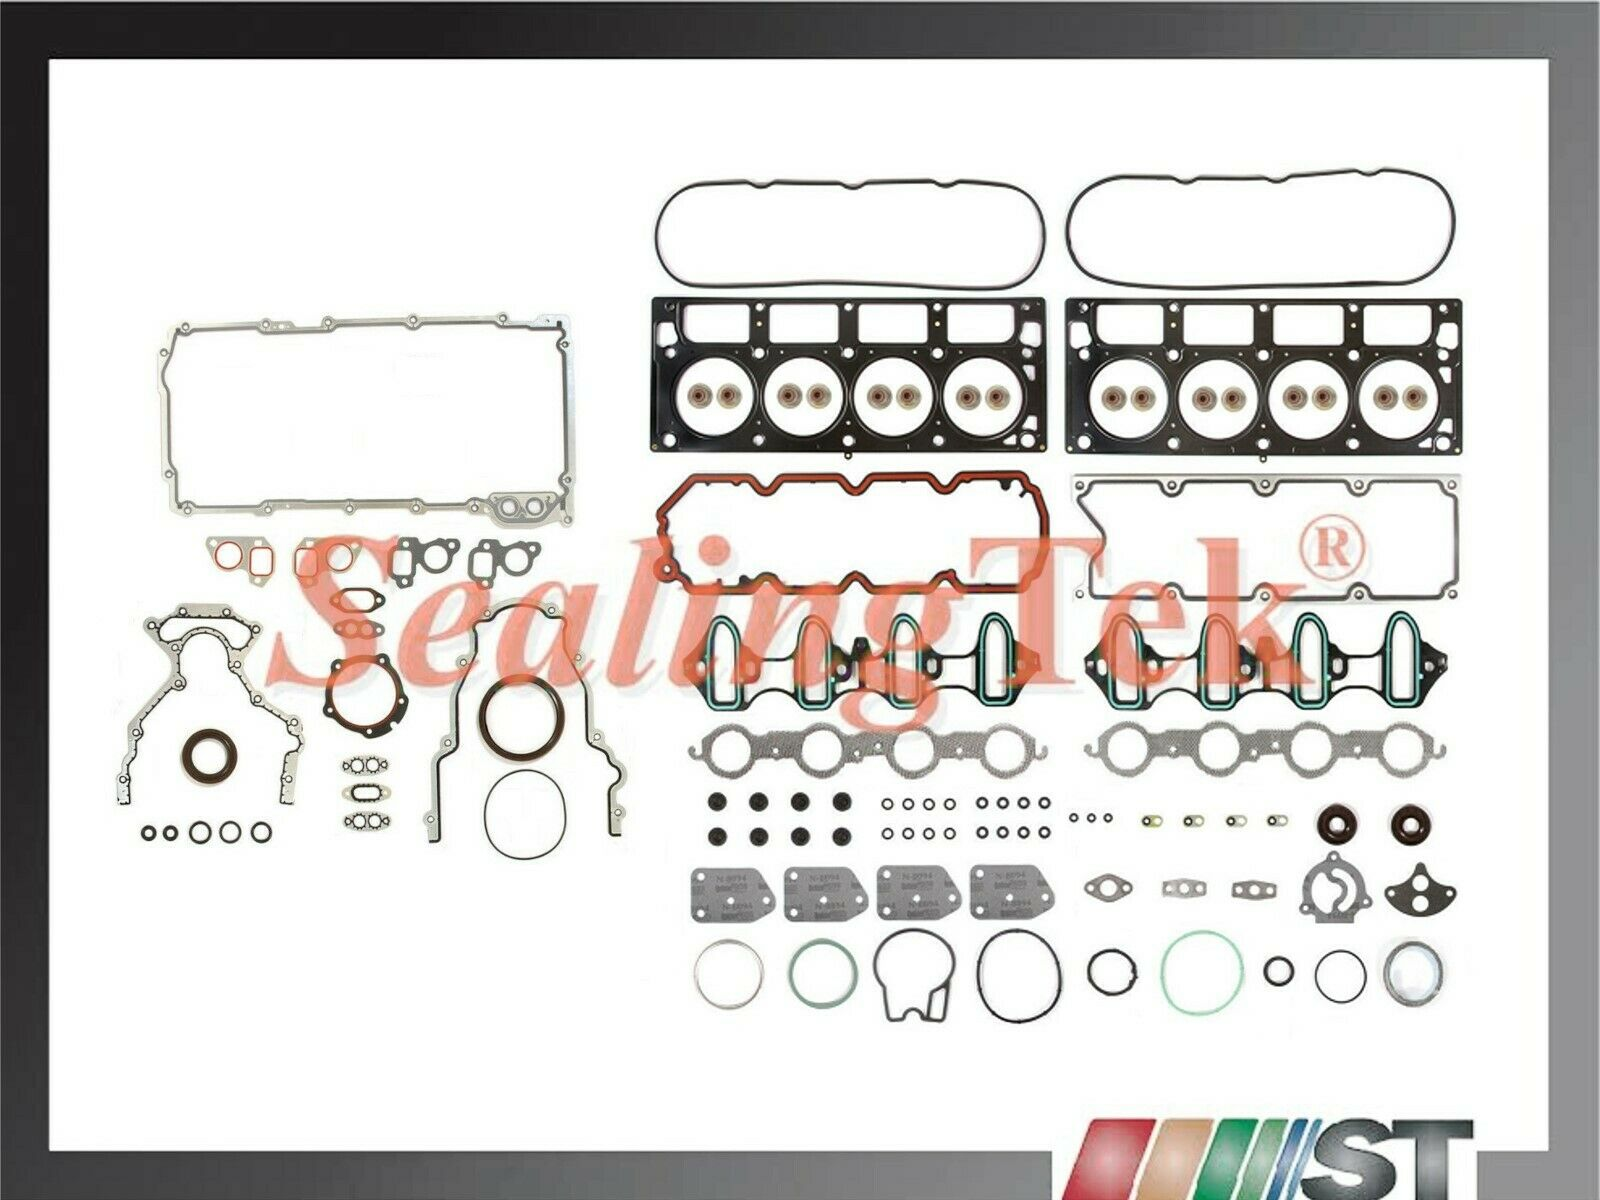 04 05 06 07 Buick Rainier 325 5.3L OHV V8  VORTEC  Main /& Rod Bearings